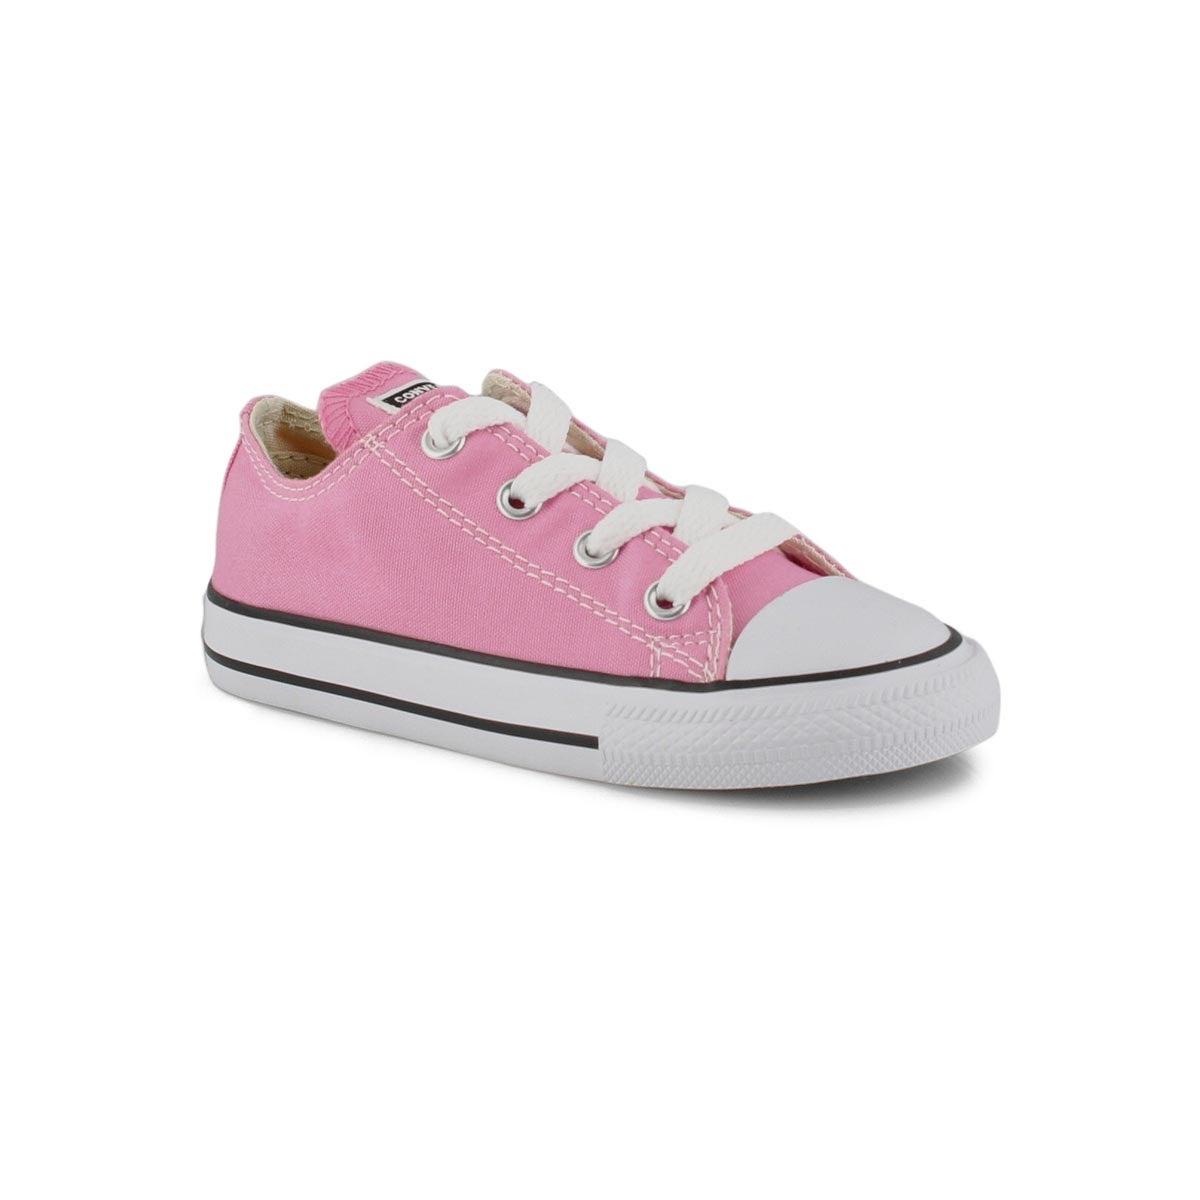 Infs CTAS Core pink sneaker